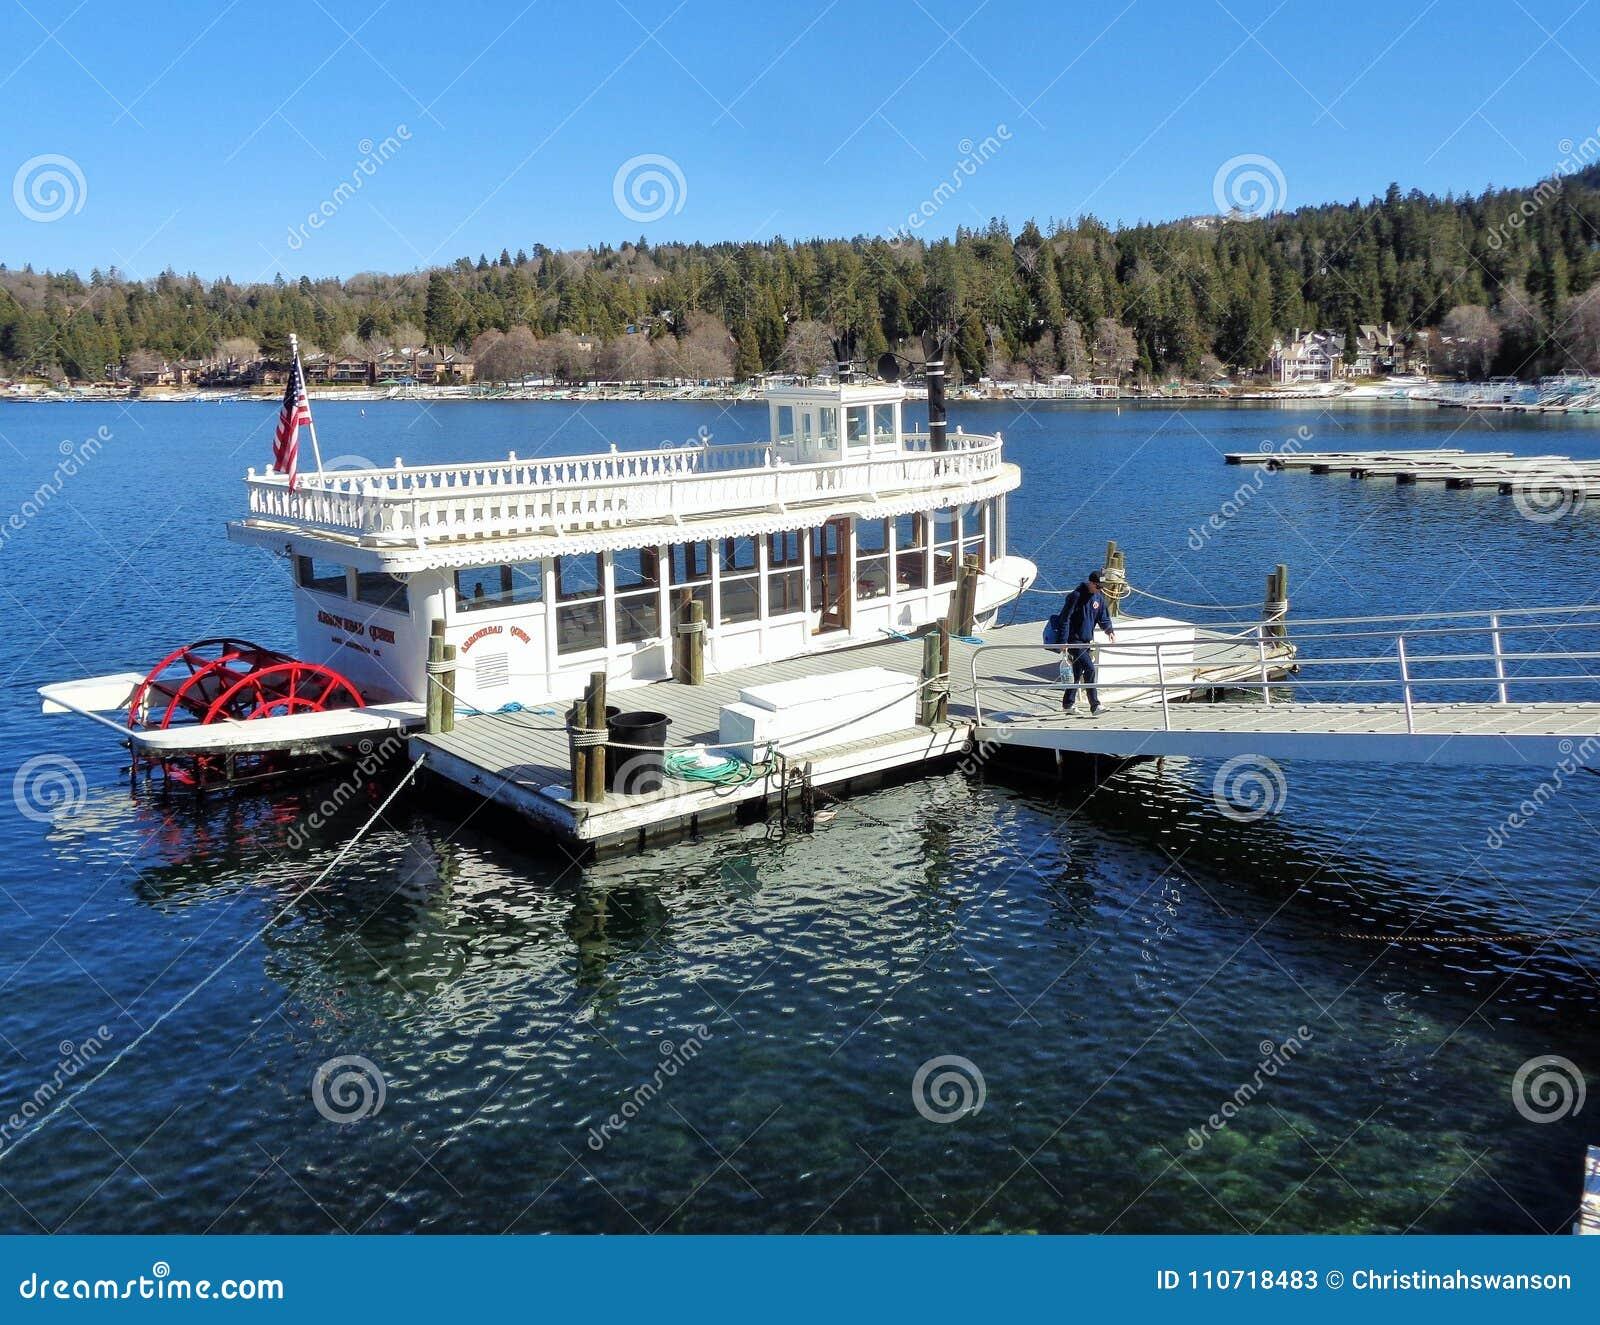 Barco da roda de pás da rainha da seta do lago na doca